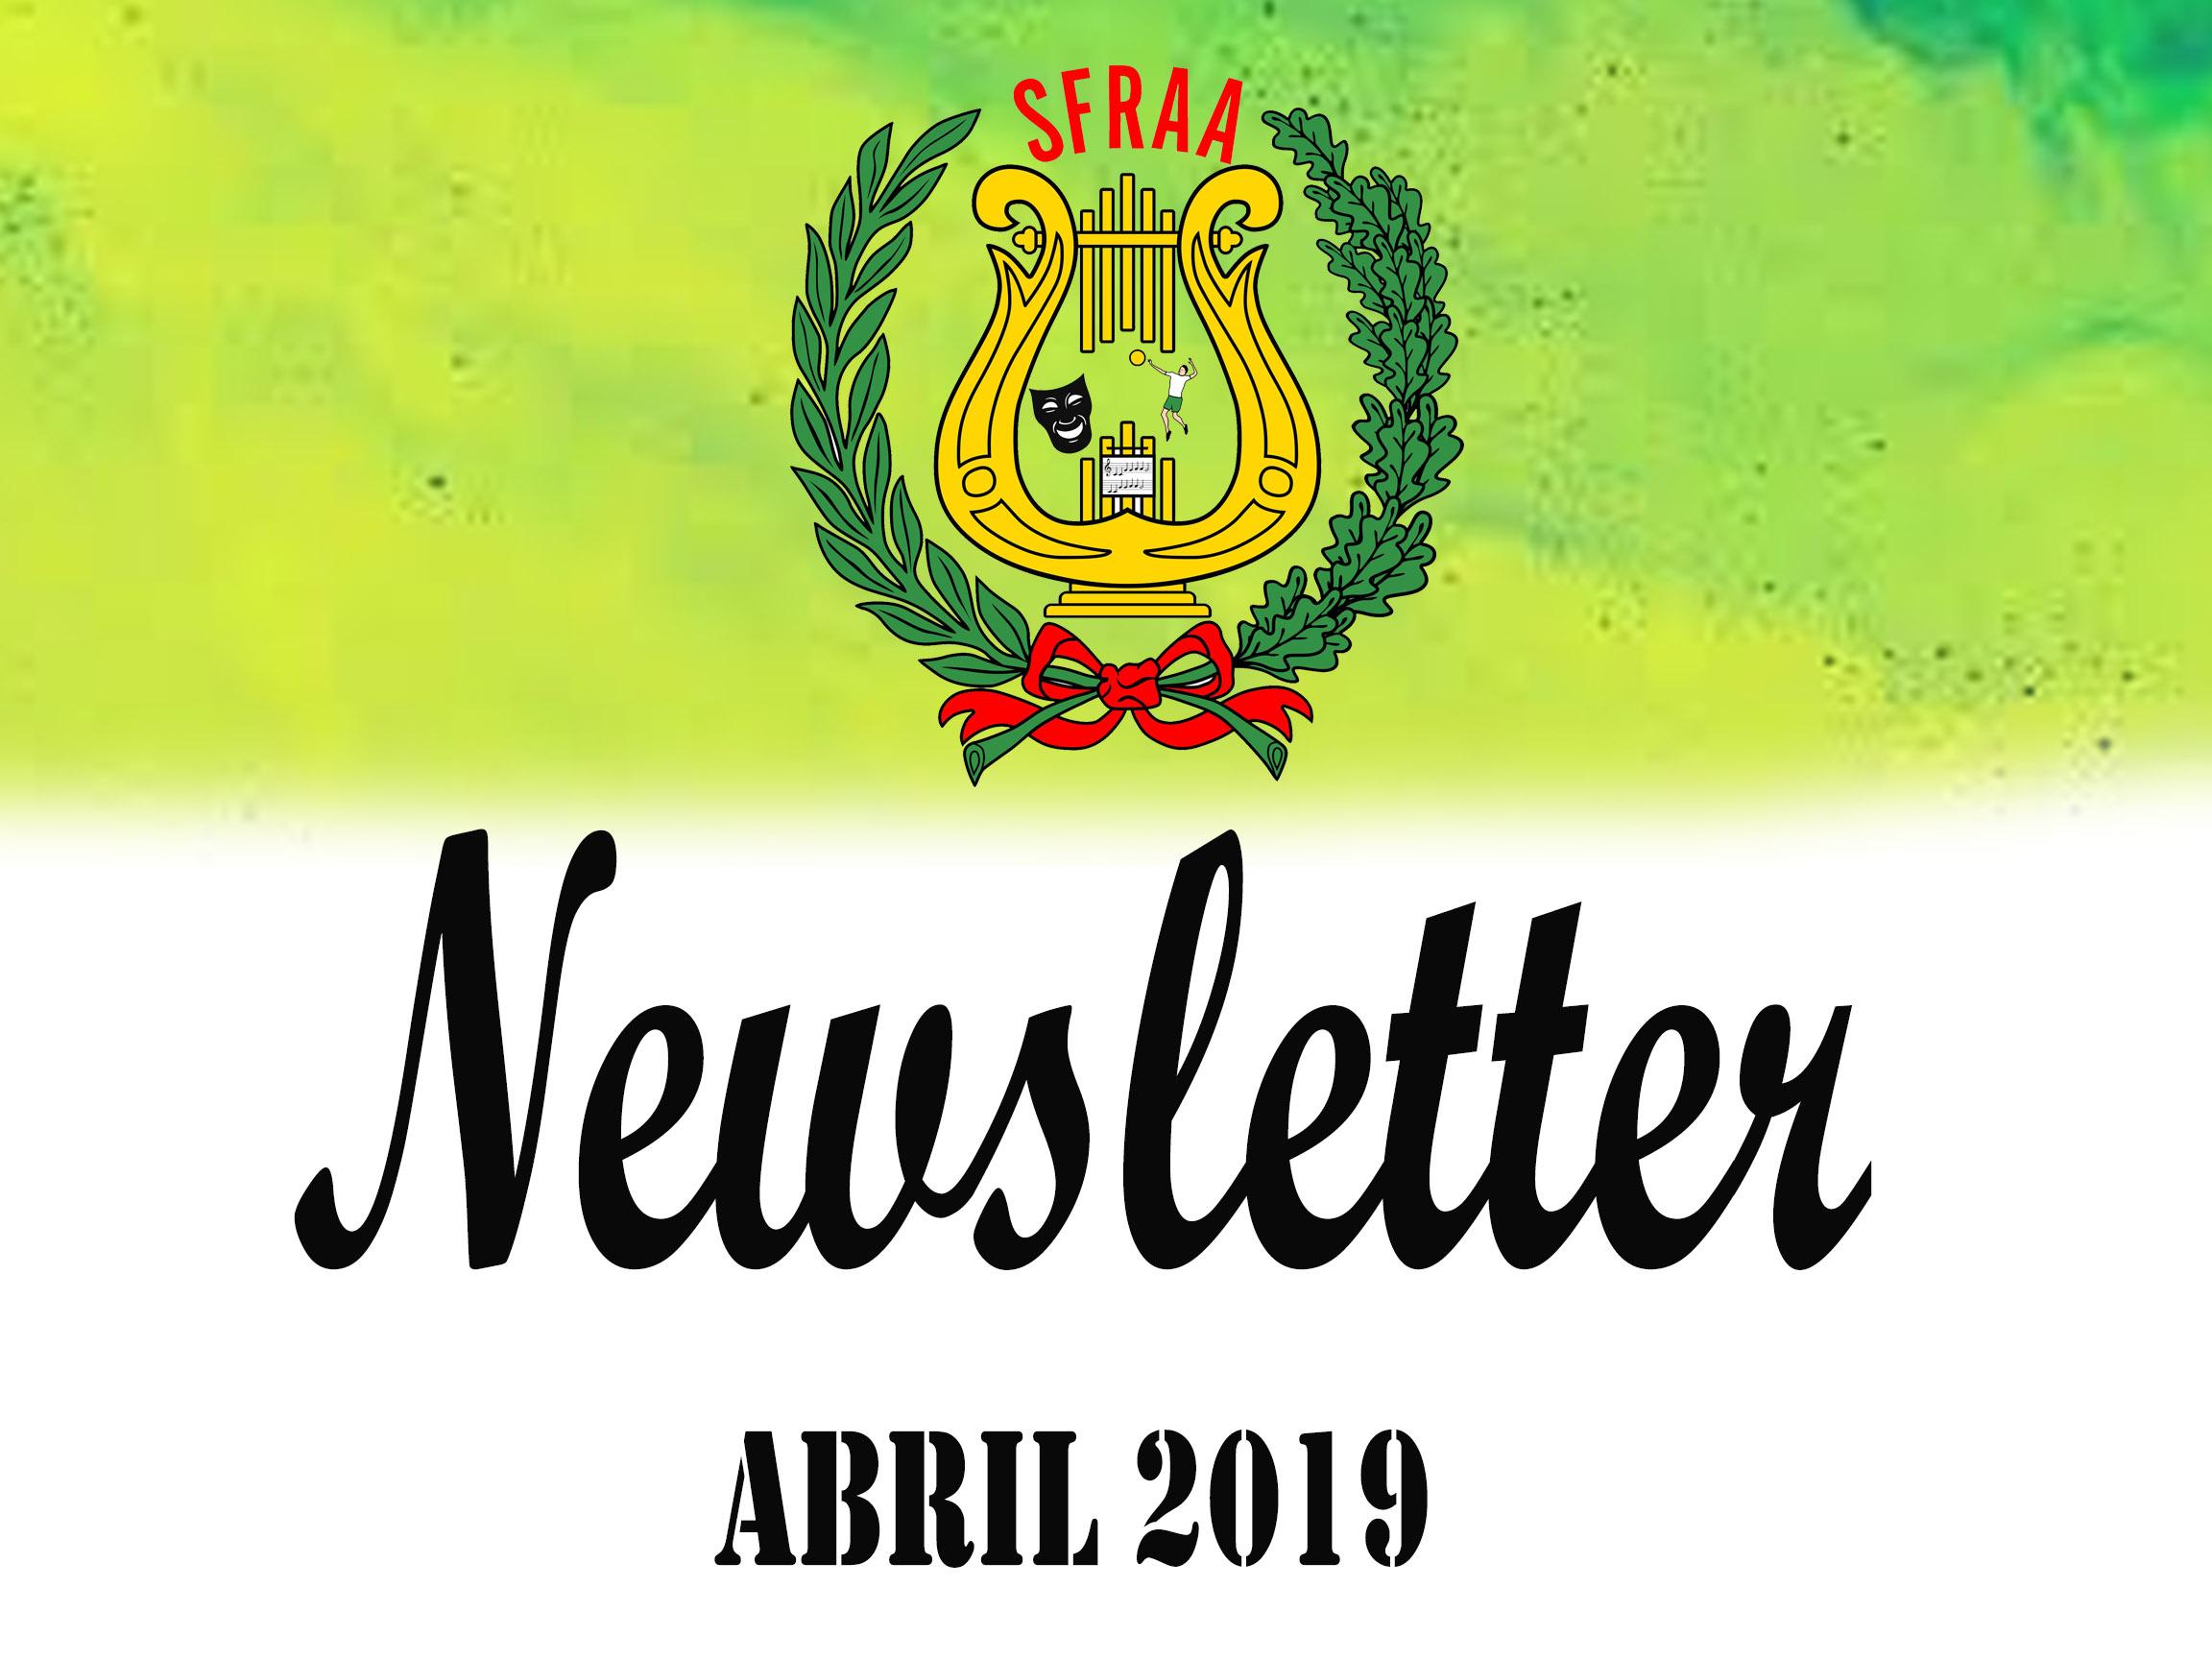 Newsletter – Abril 2019